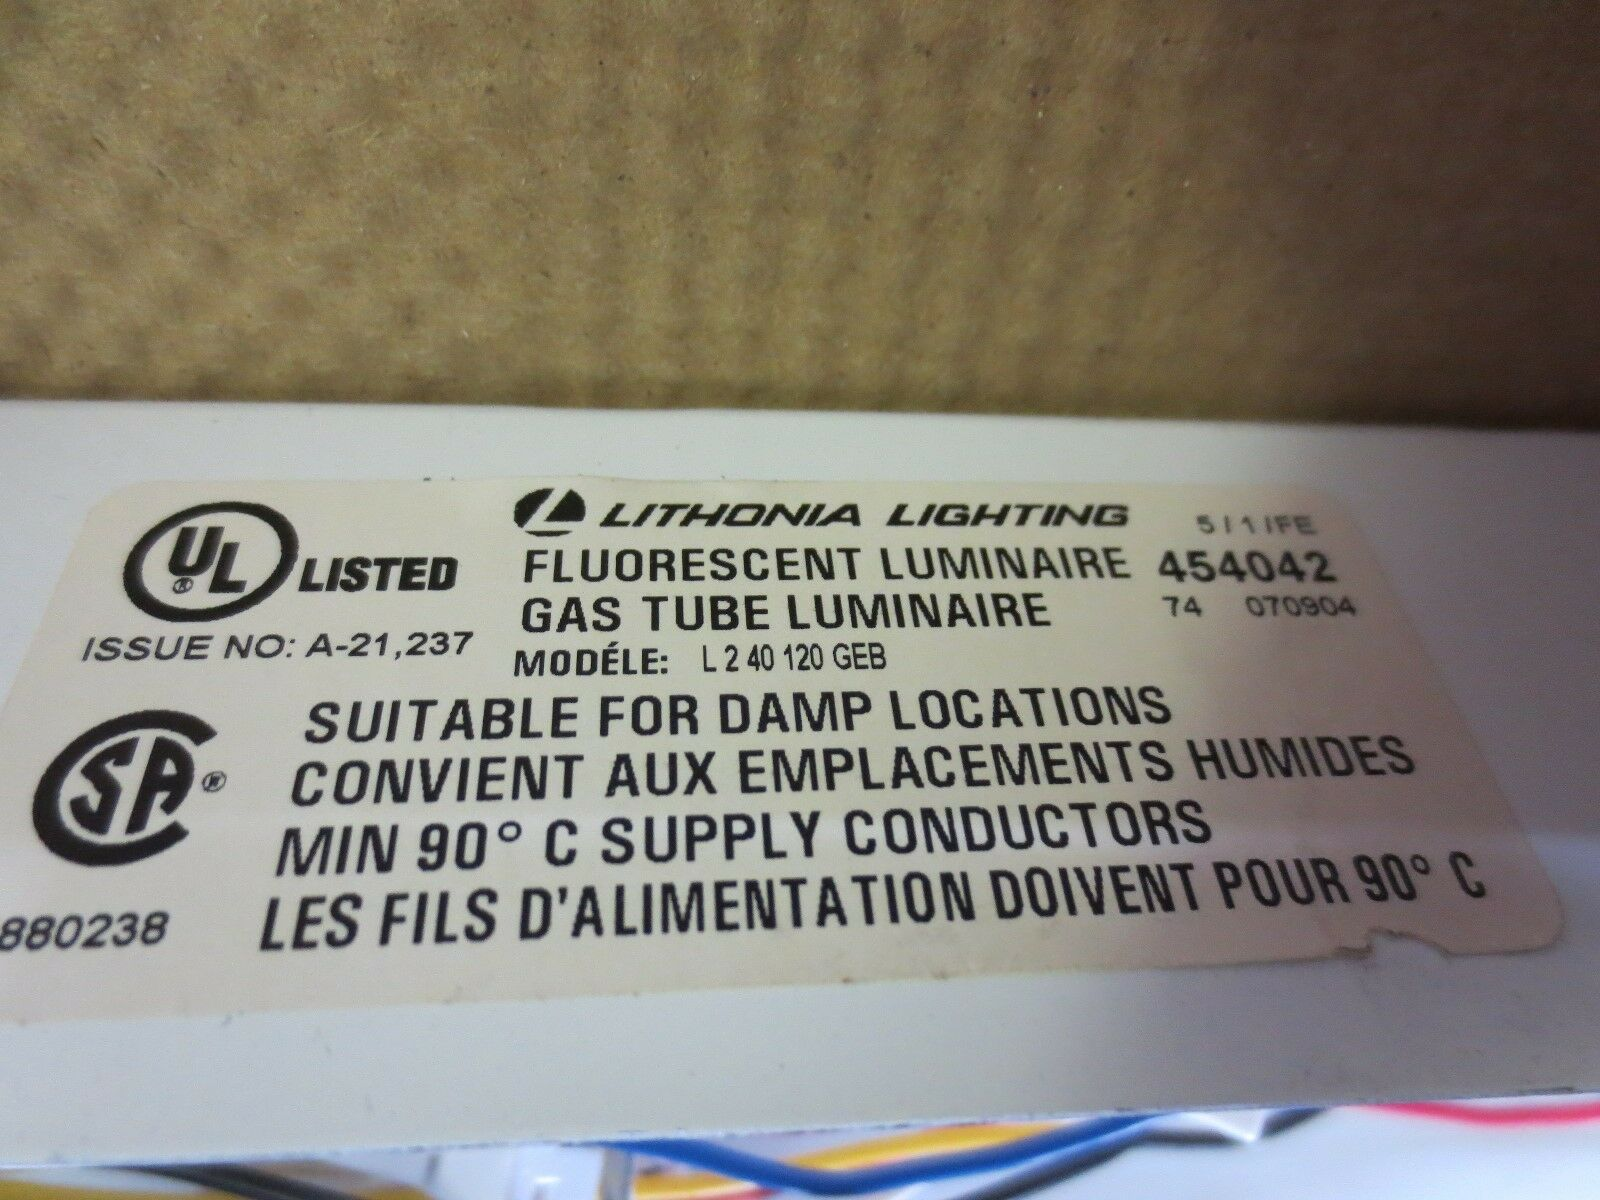 Lithonia Lighting L 2 40 120 Geb Fluorescent Gas Tube Luminaire Ebay Further Single Pole Light Switch Diagram